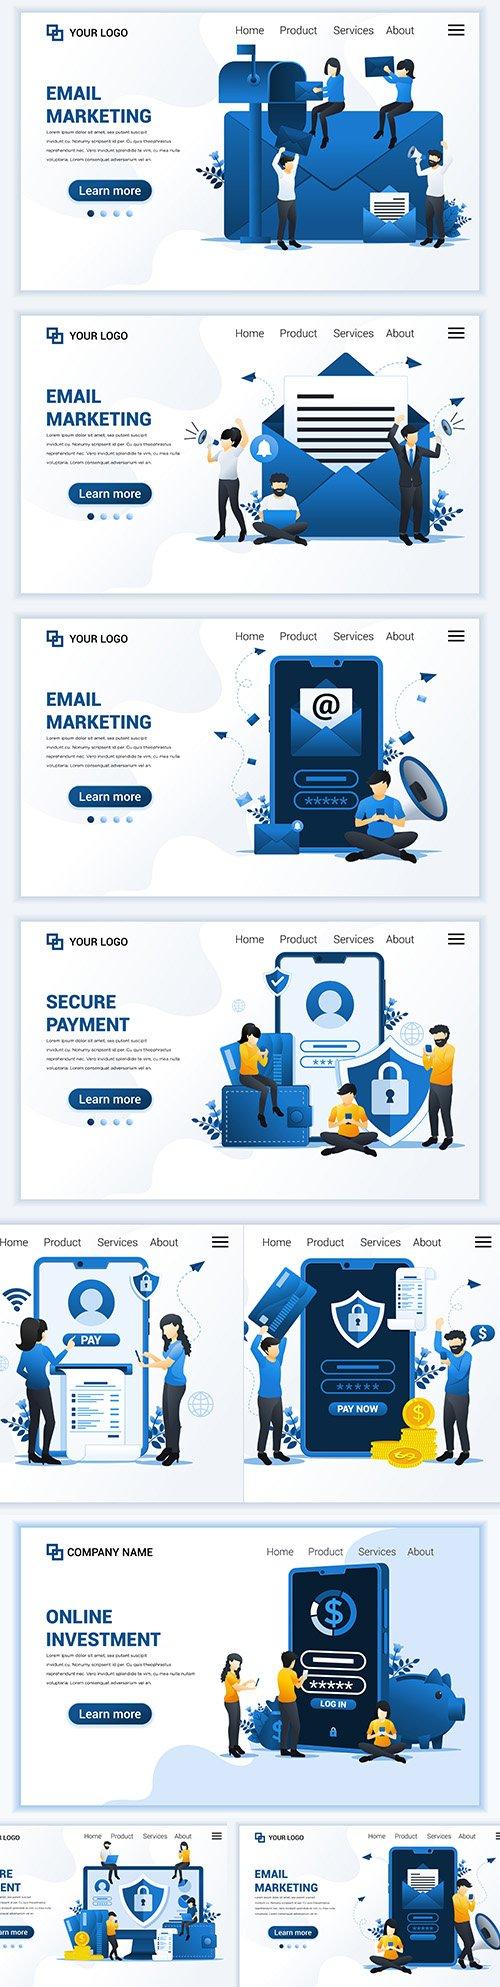 Email marketing landing page flat design